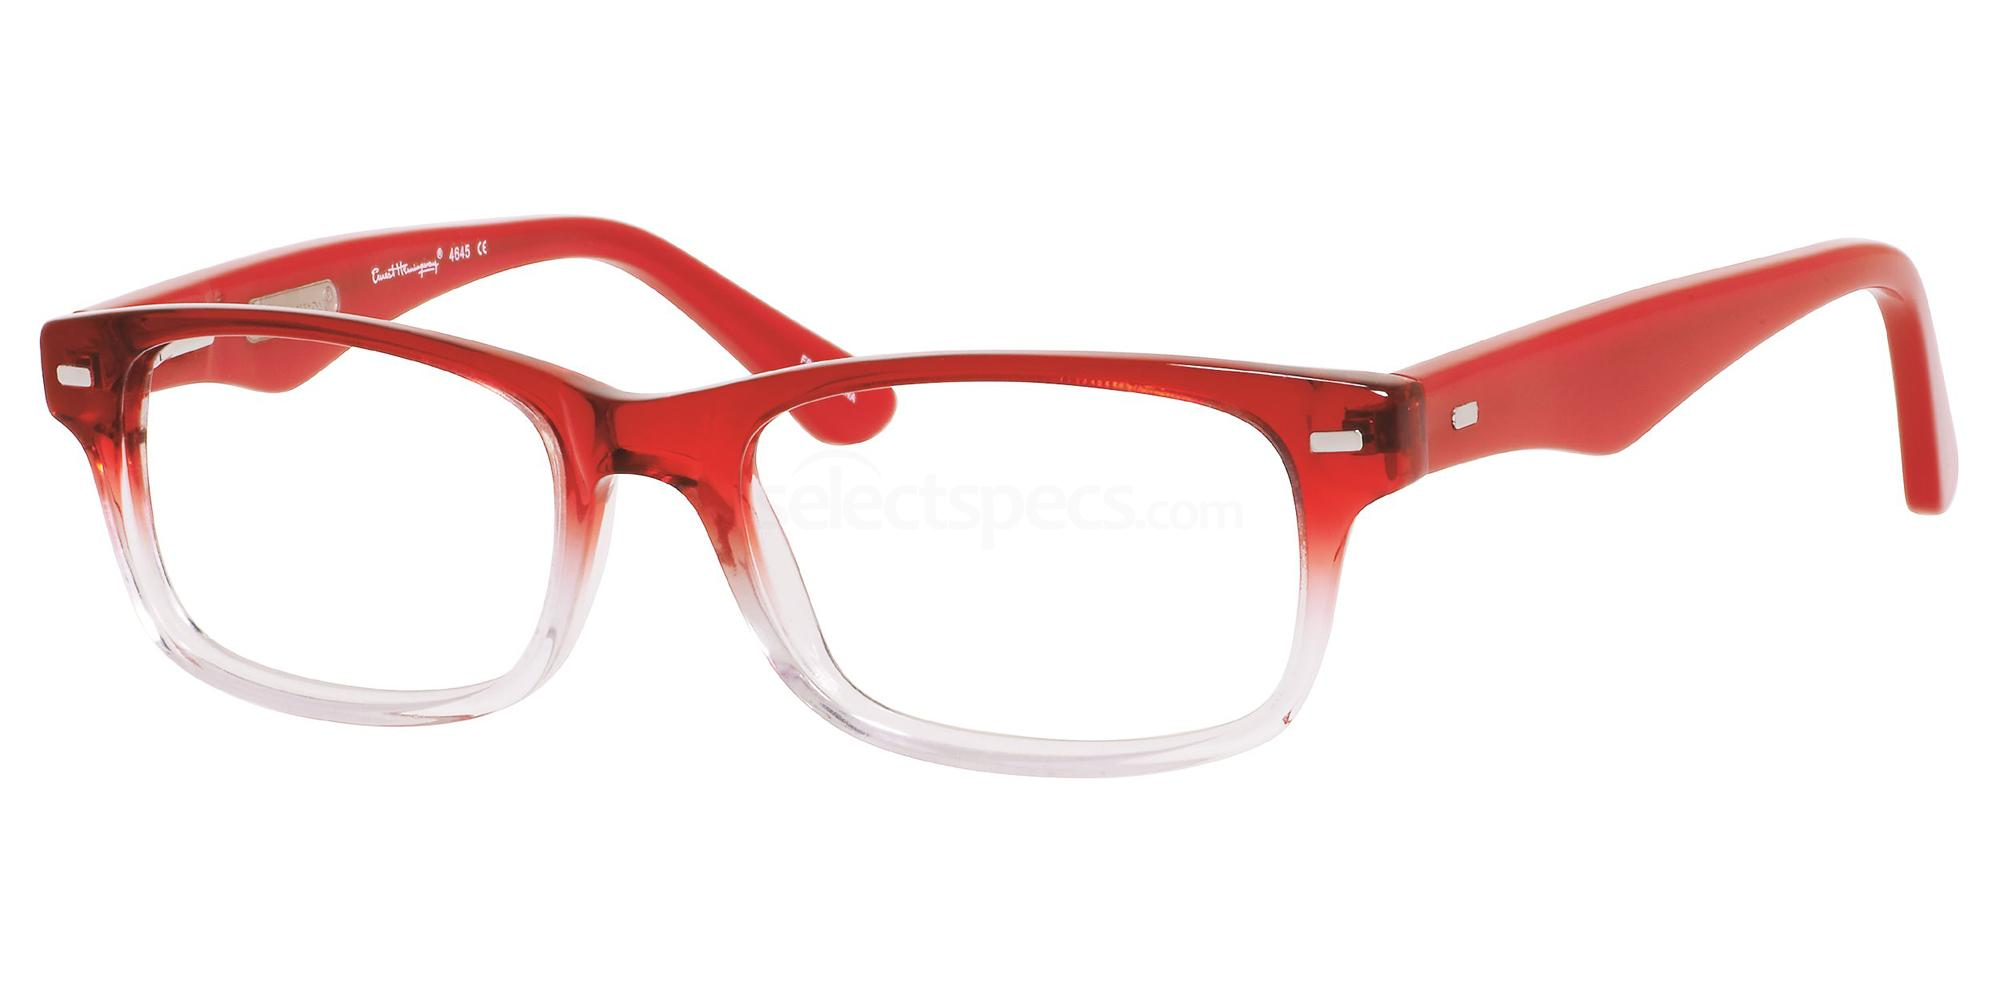 02 EH4645 Glasses, Ernest Hemmingway